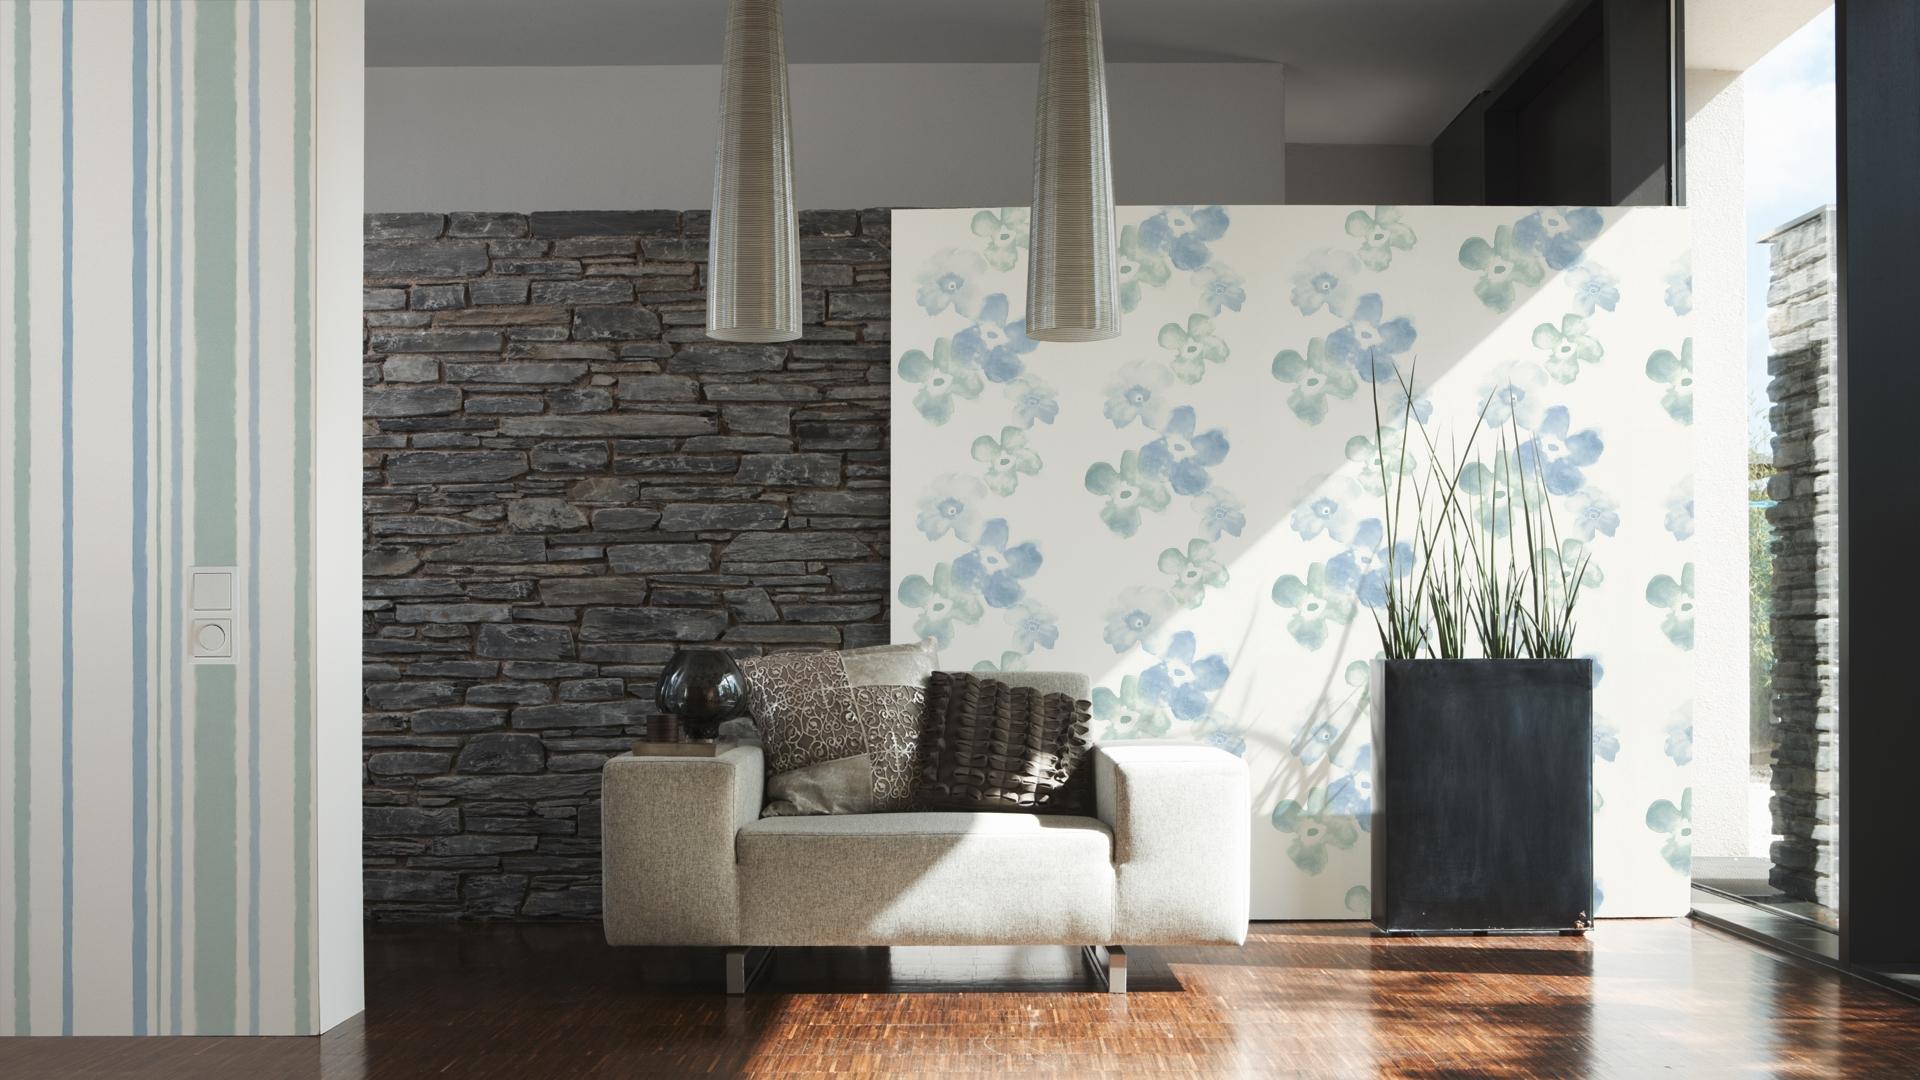 Esprit Home Tapete Stockholm, Mustertapete, floral, signalweiß, minttürkis, pastellblau